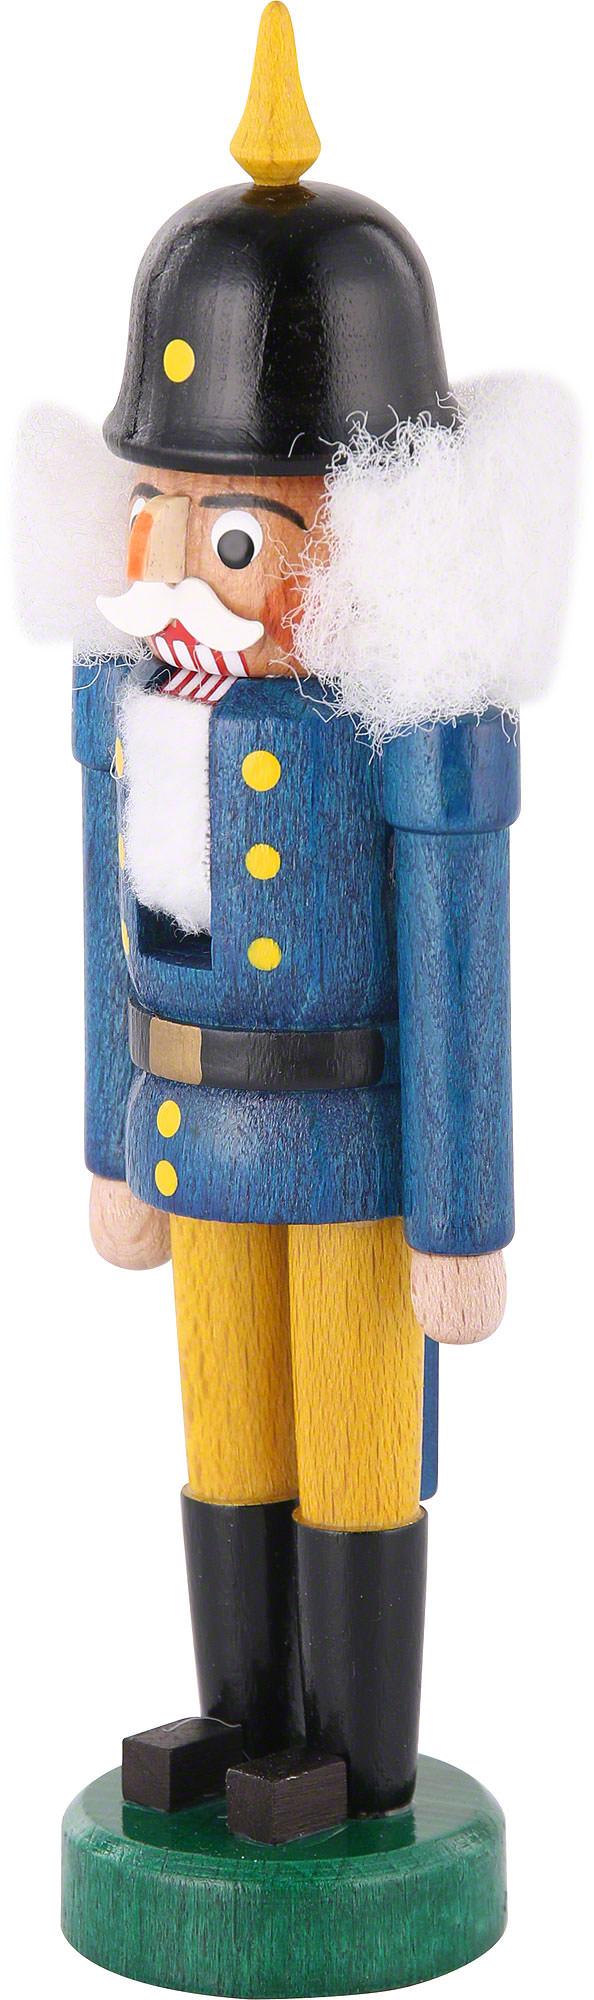 Nussknacker mit Pickelhaube blau-gelb BxHxT 5 cmx14 cmx3 cm NEU Erzgebirge